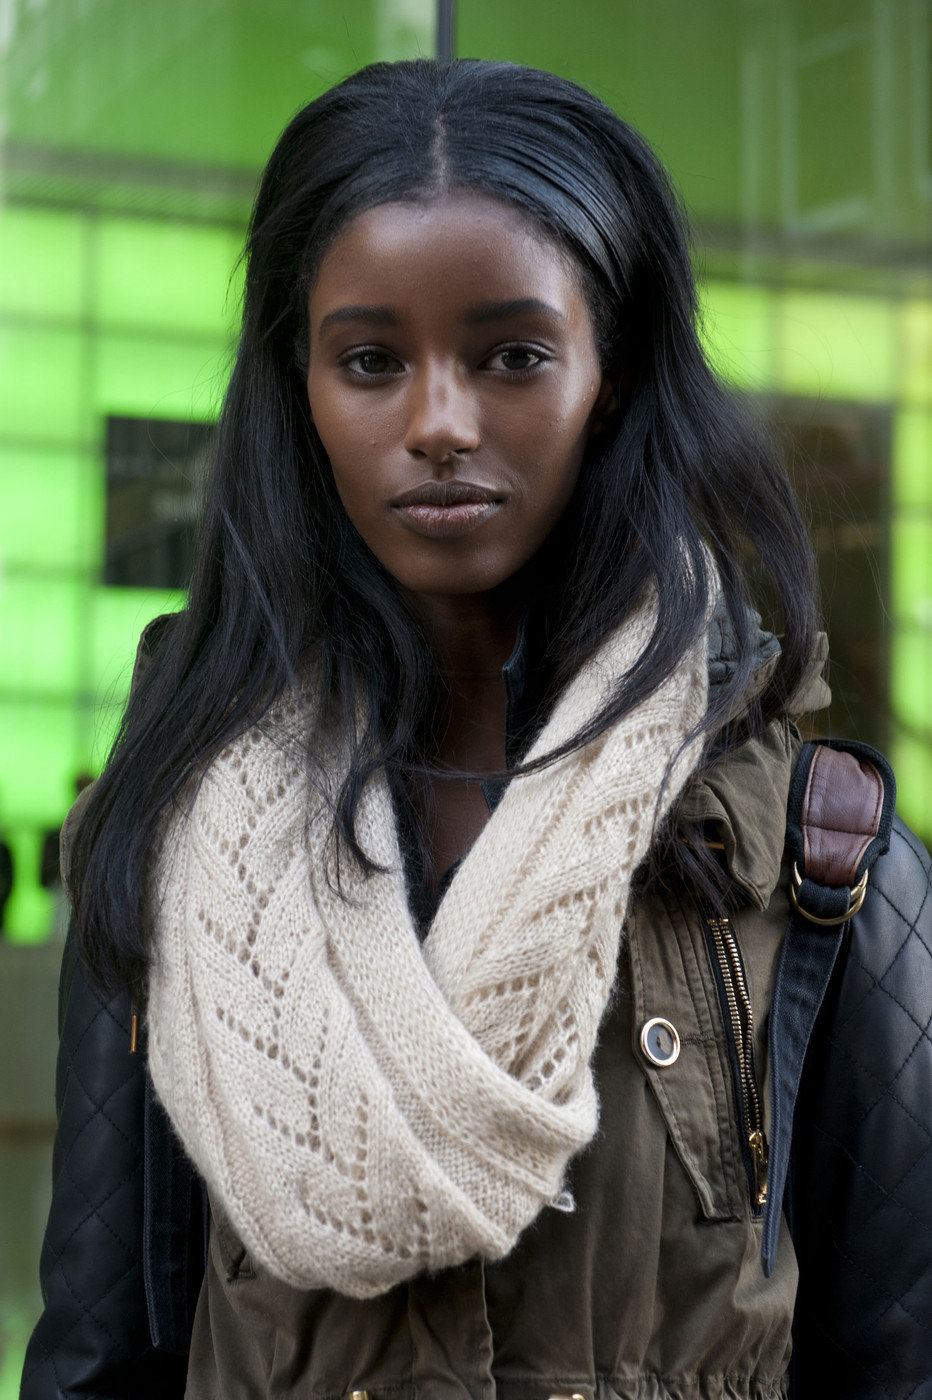 ethiopian-teen-babes-hot-nude-firls